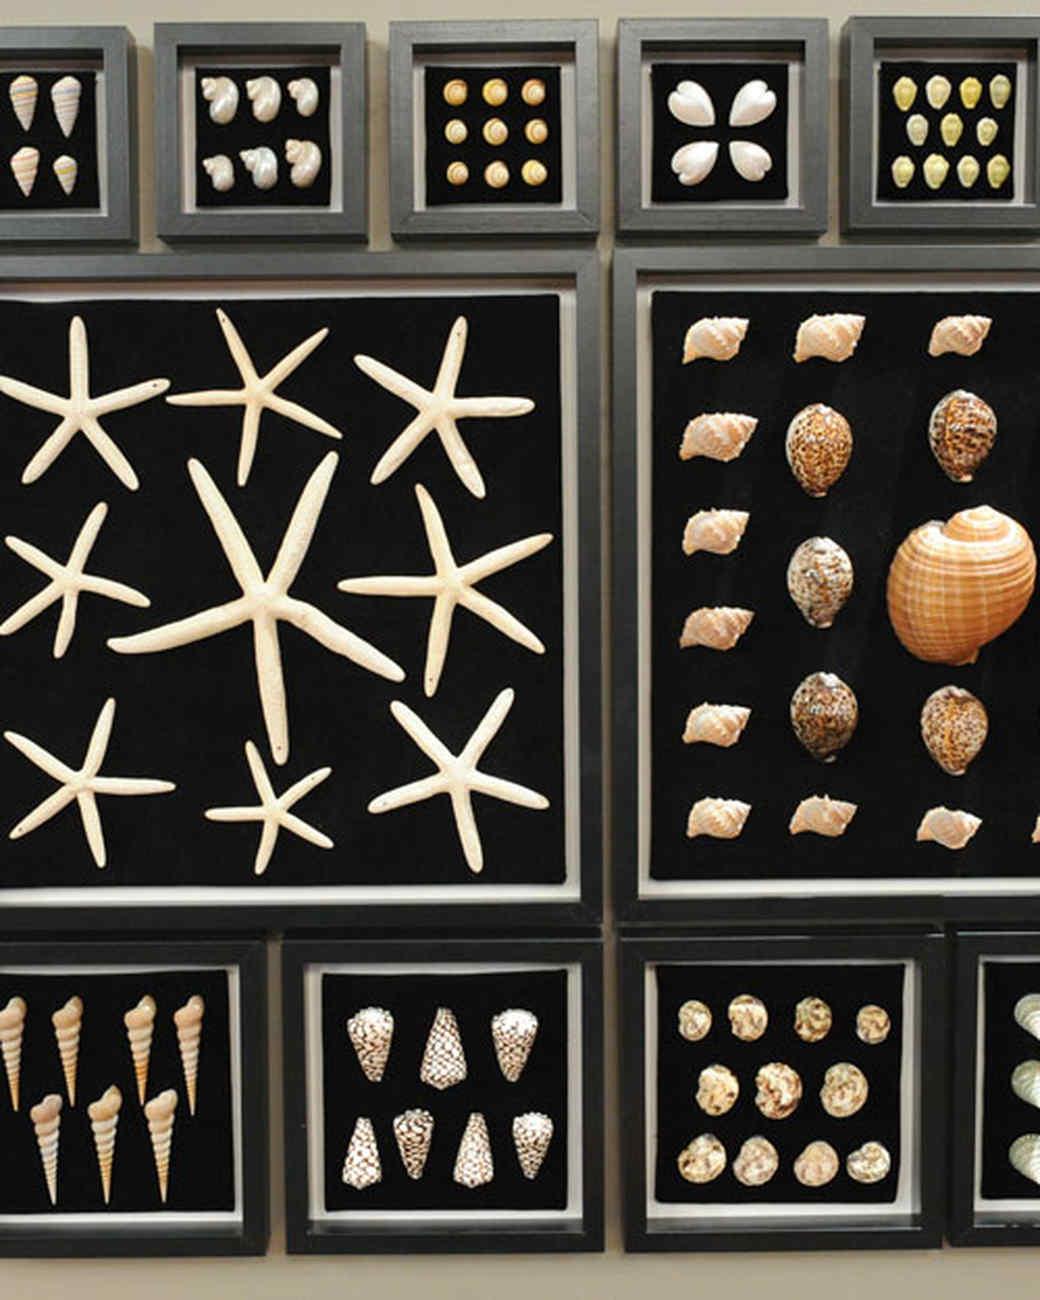 6021_100610_collection_frames.jpg